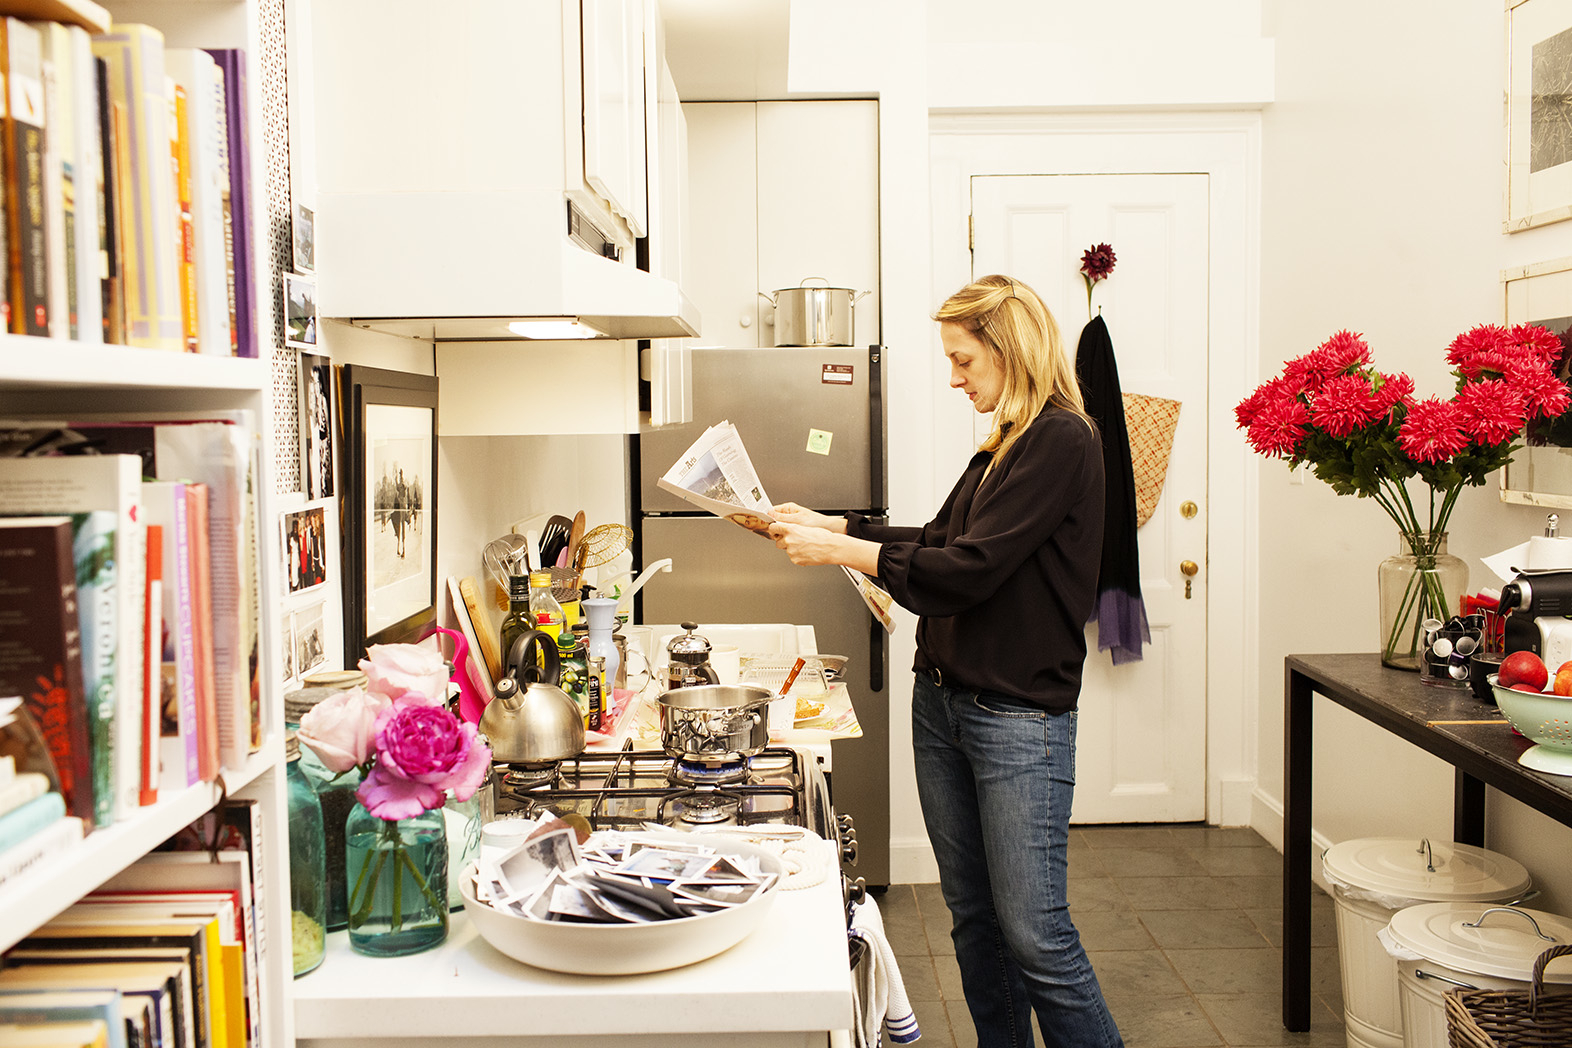 Rita-konig-new-york-apartment-the-selby-7